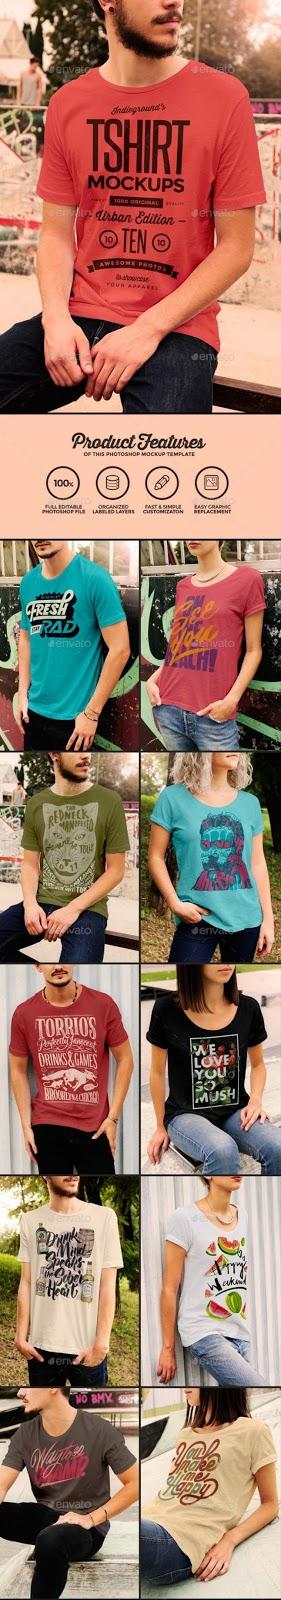 2. Urban T-Shirt Mockups